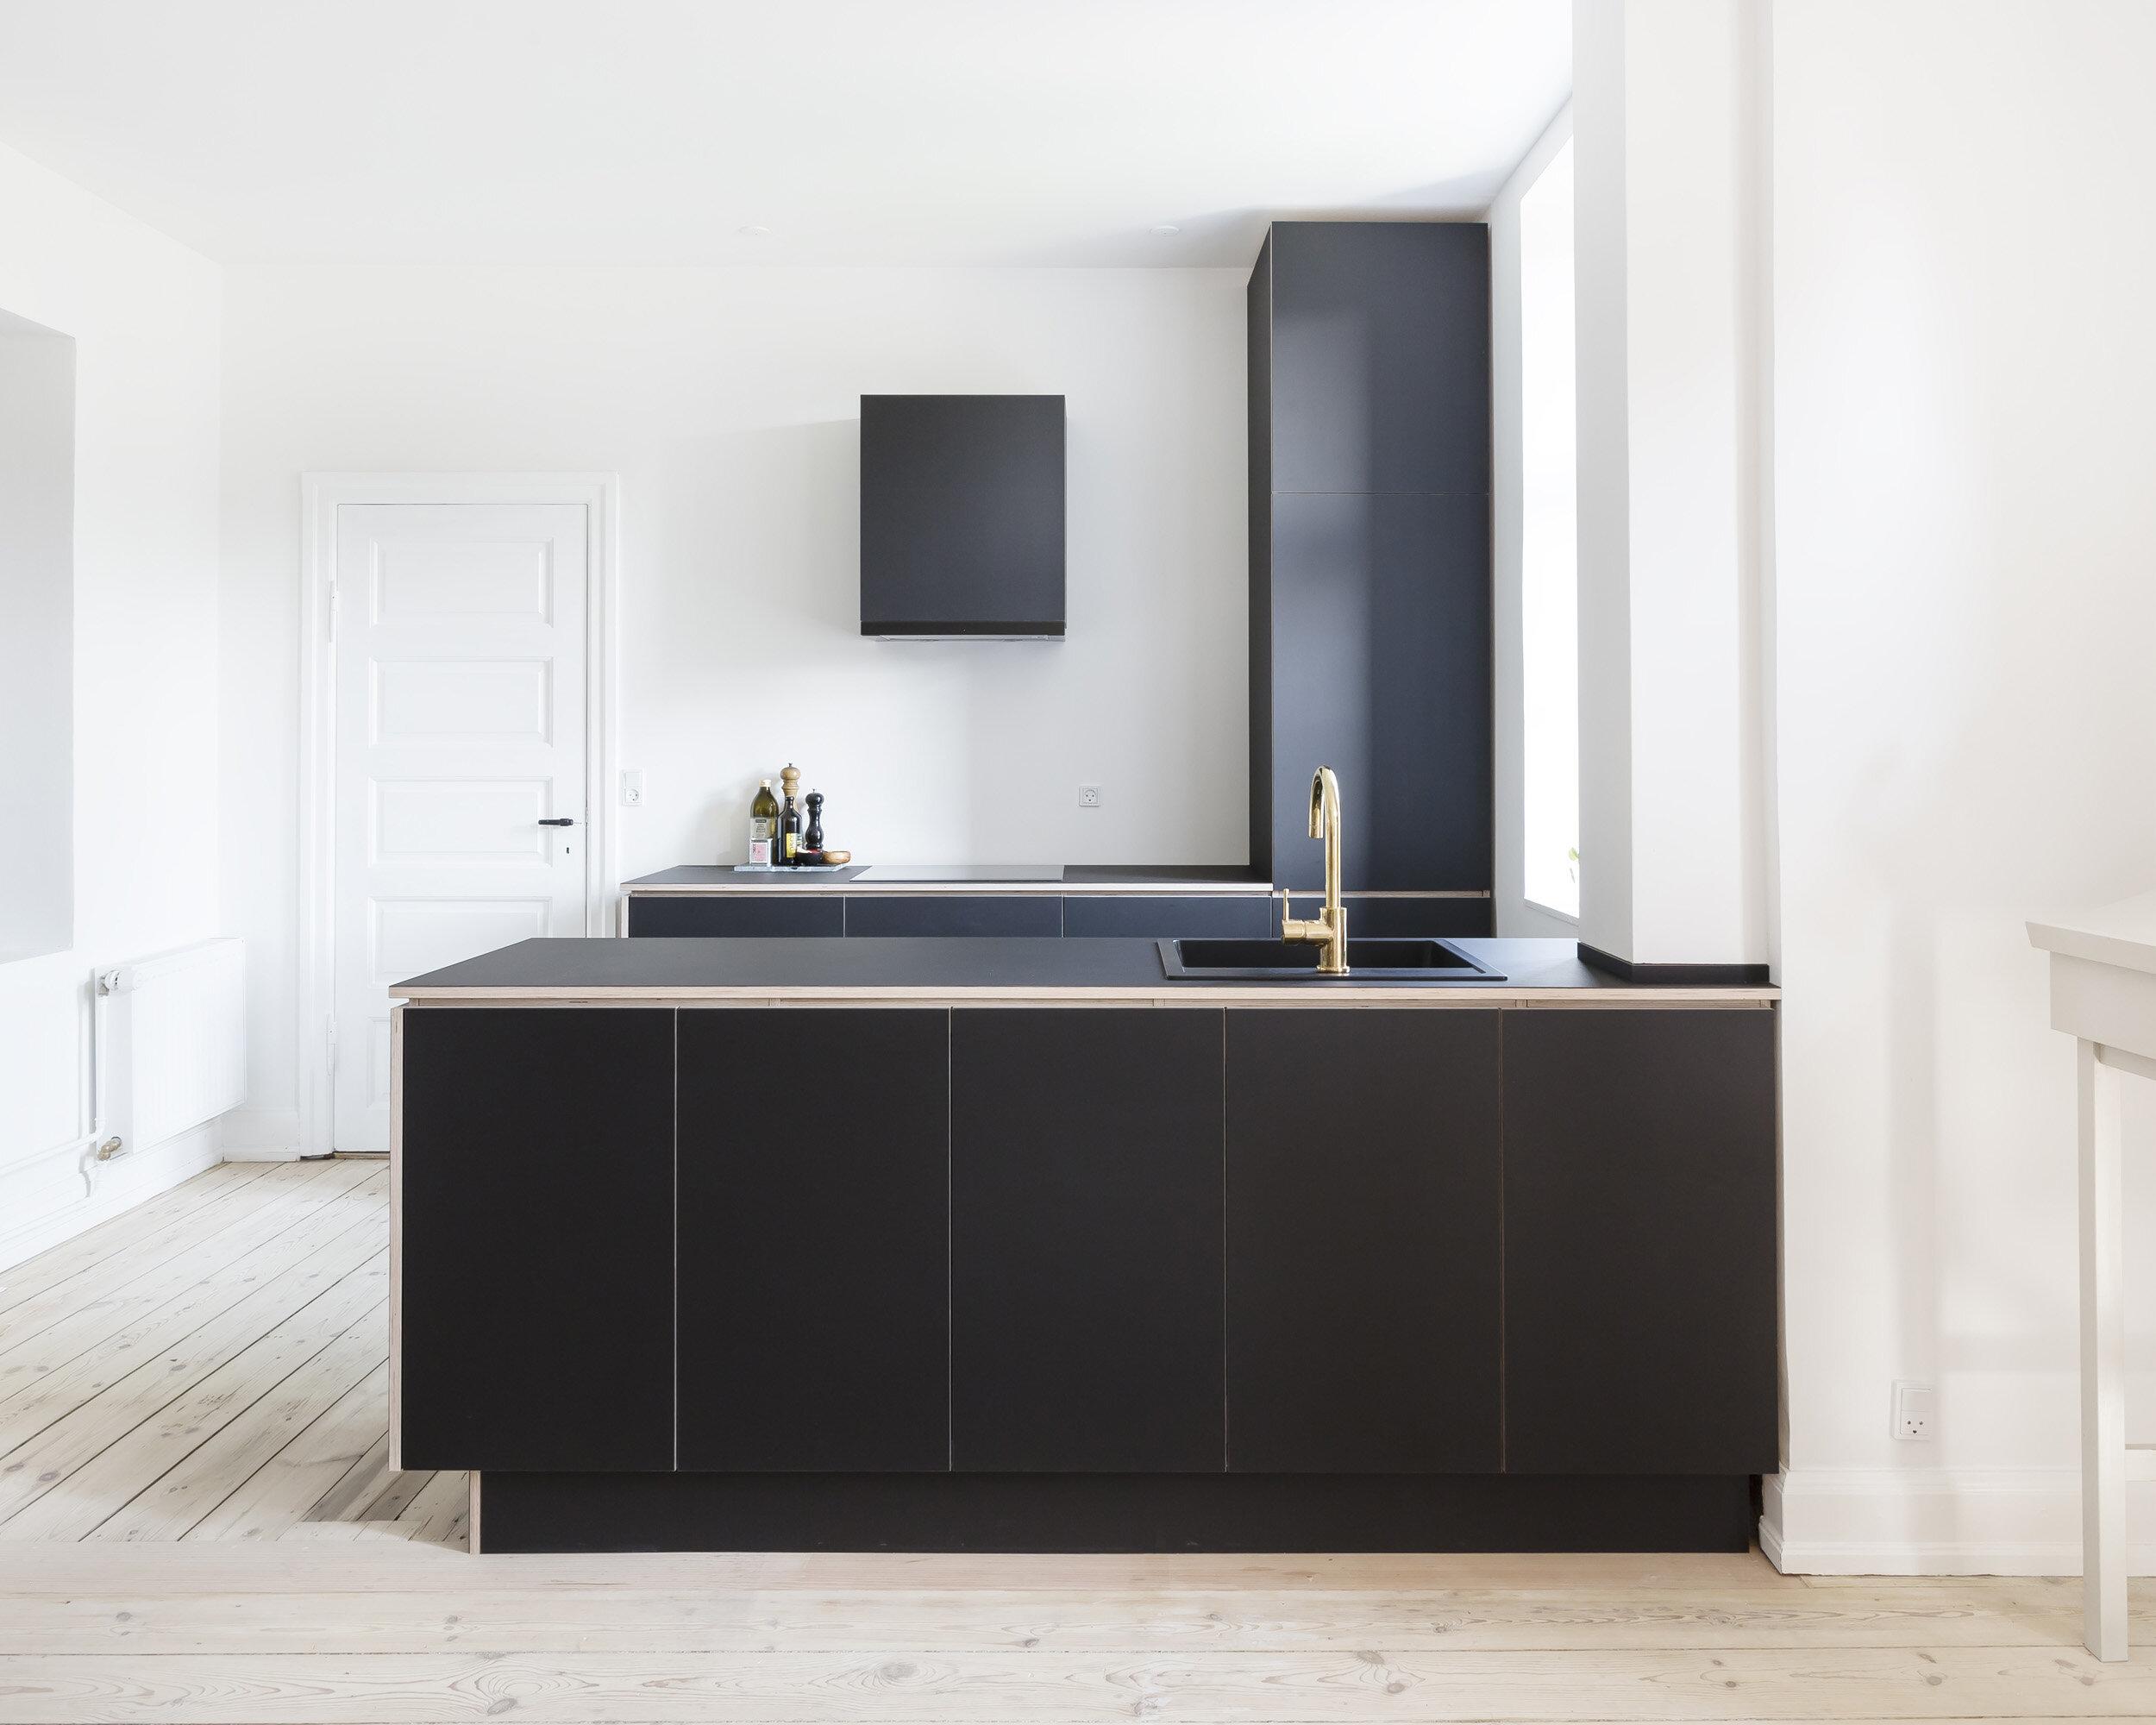 0437-m3h1-kitchen-family room-custom-linoleum-minimal-stay-project (7)-2500x.jpg